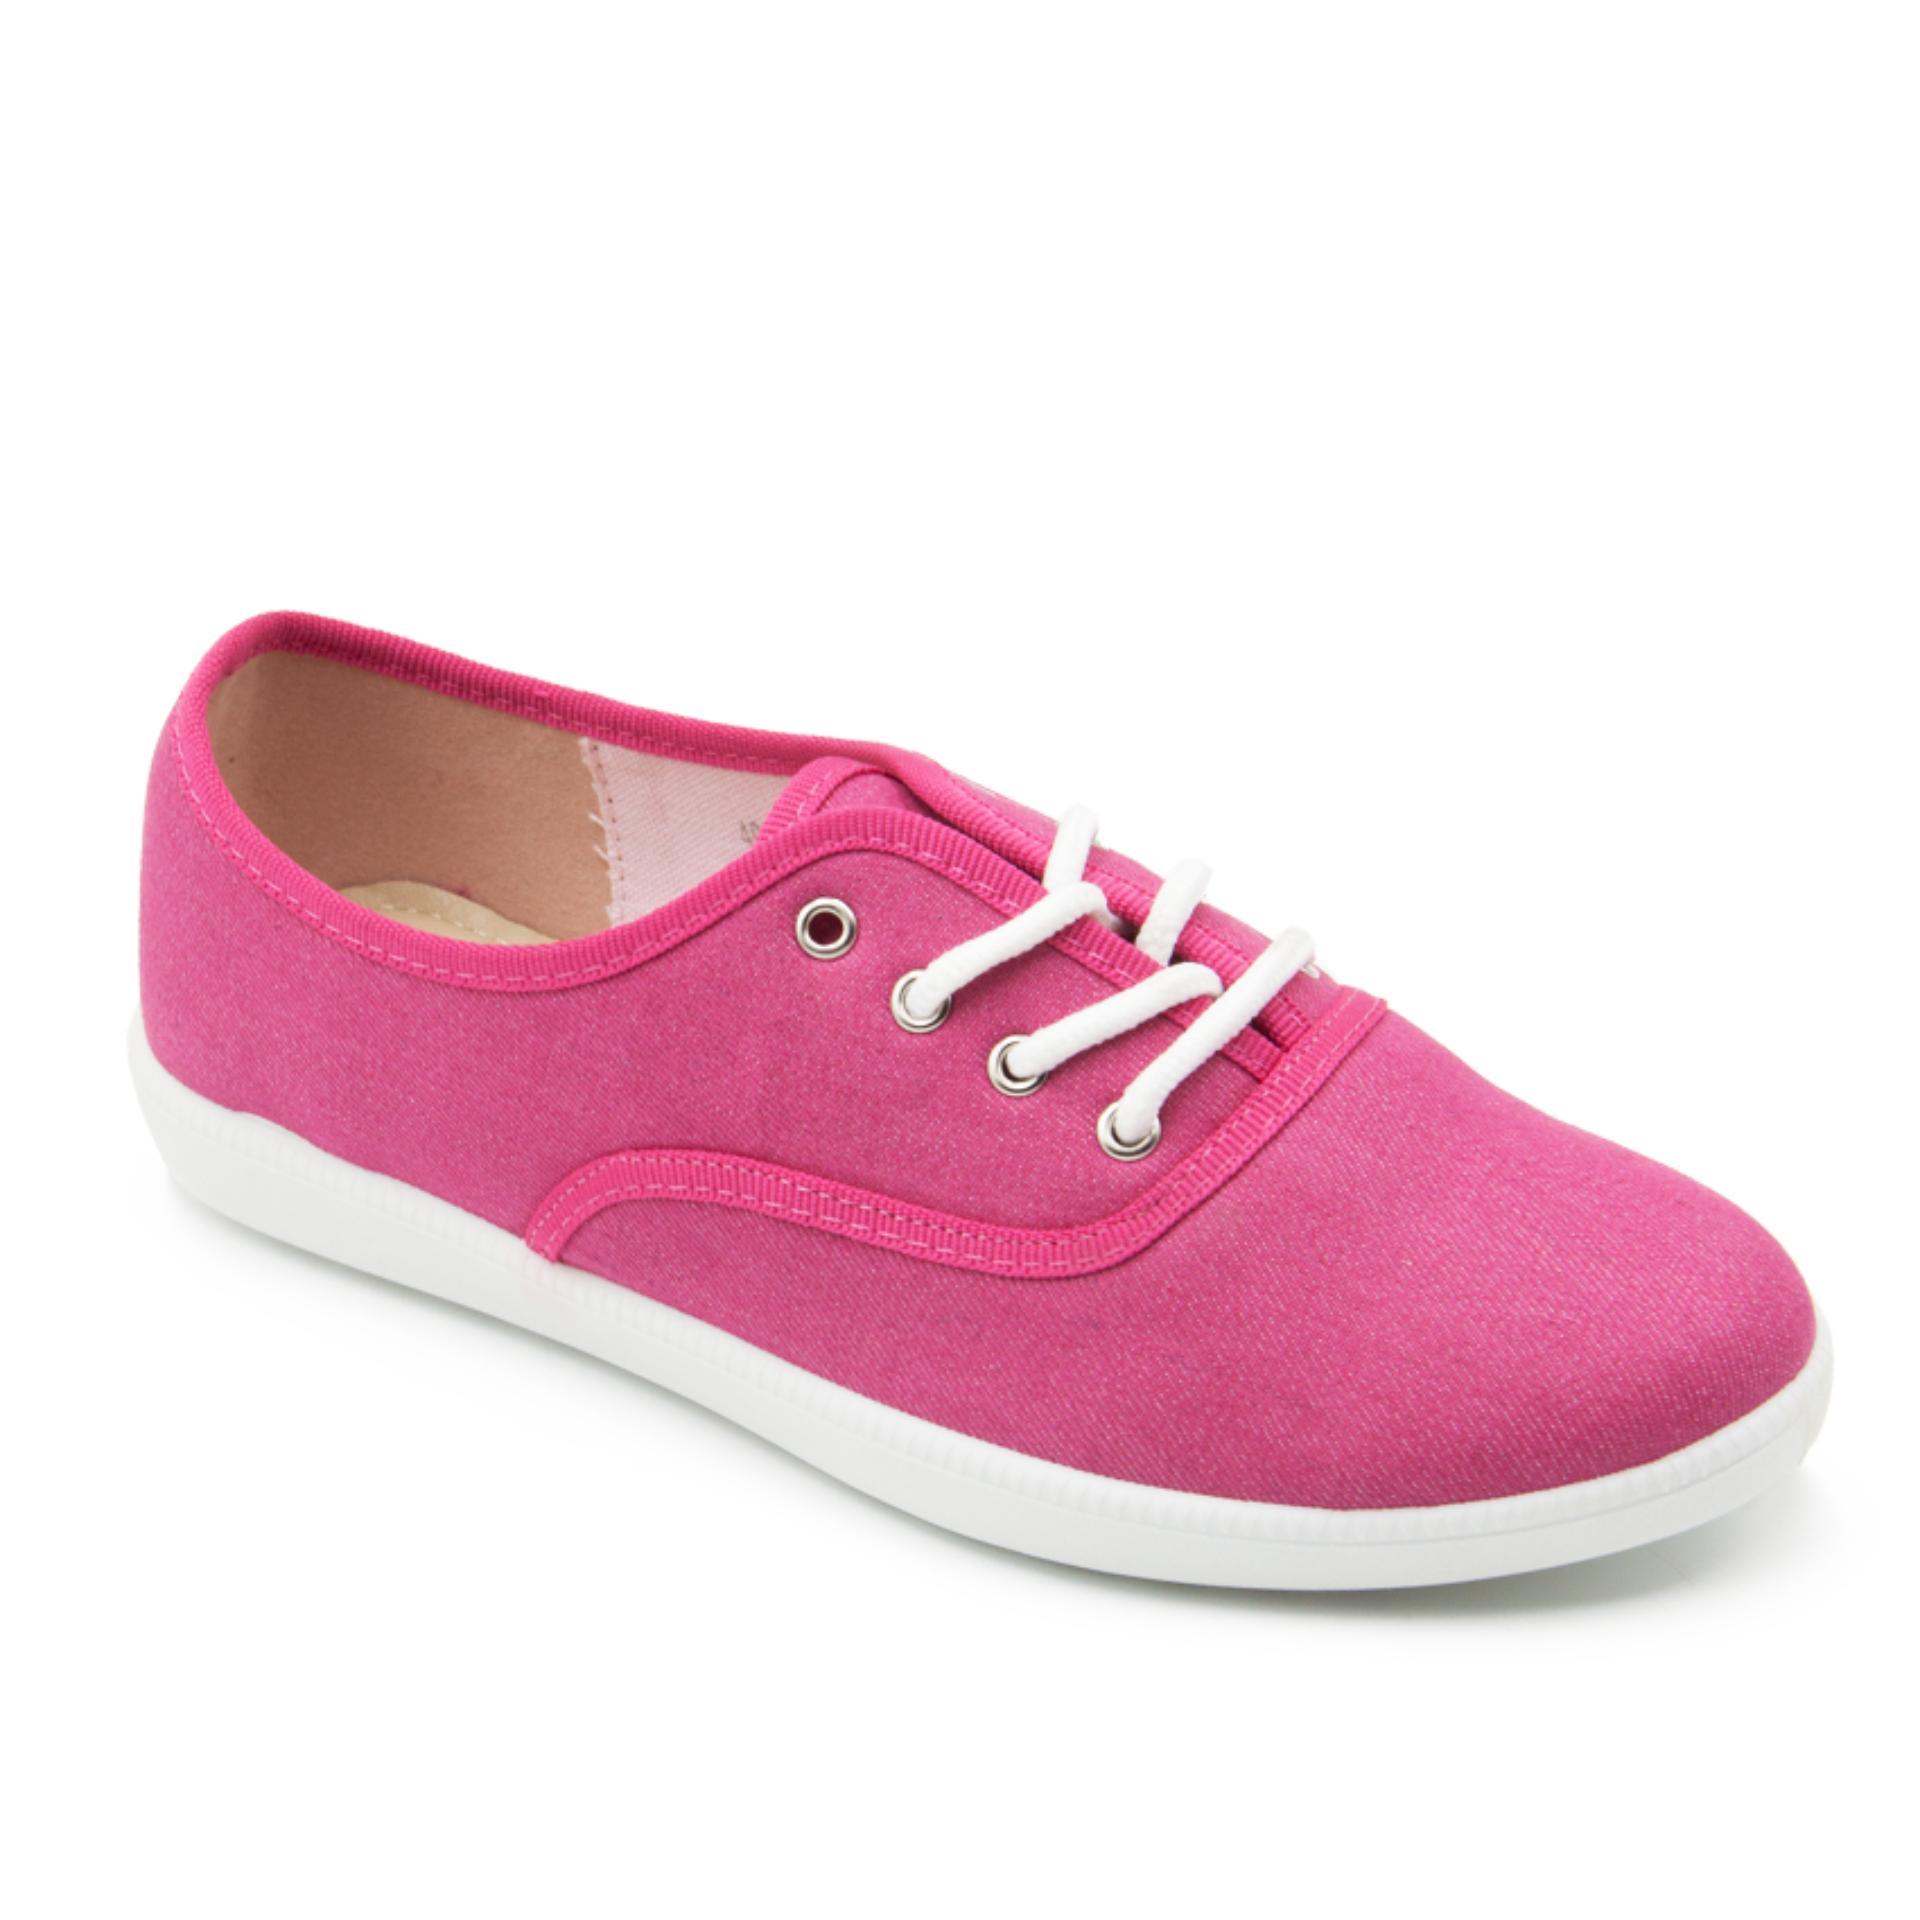 Dea Sepatu Anak Perempuan Flat 1609 364 Blue Update Daftar Harga Sneakers Lace 1704 161 Black Size 31 36 Shoes Sporty 1607 112 Fushia 41